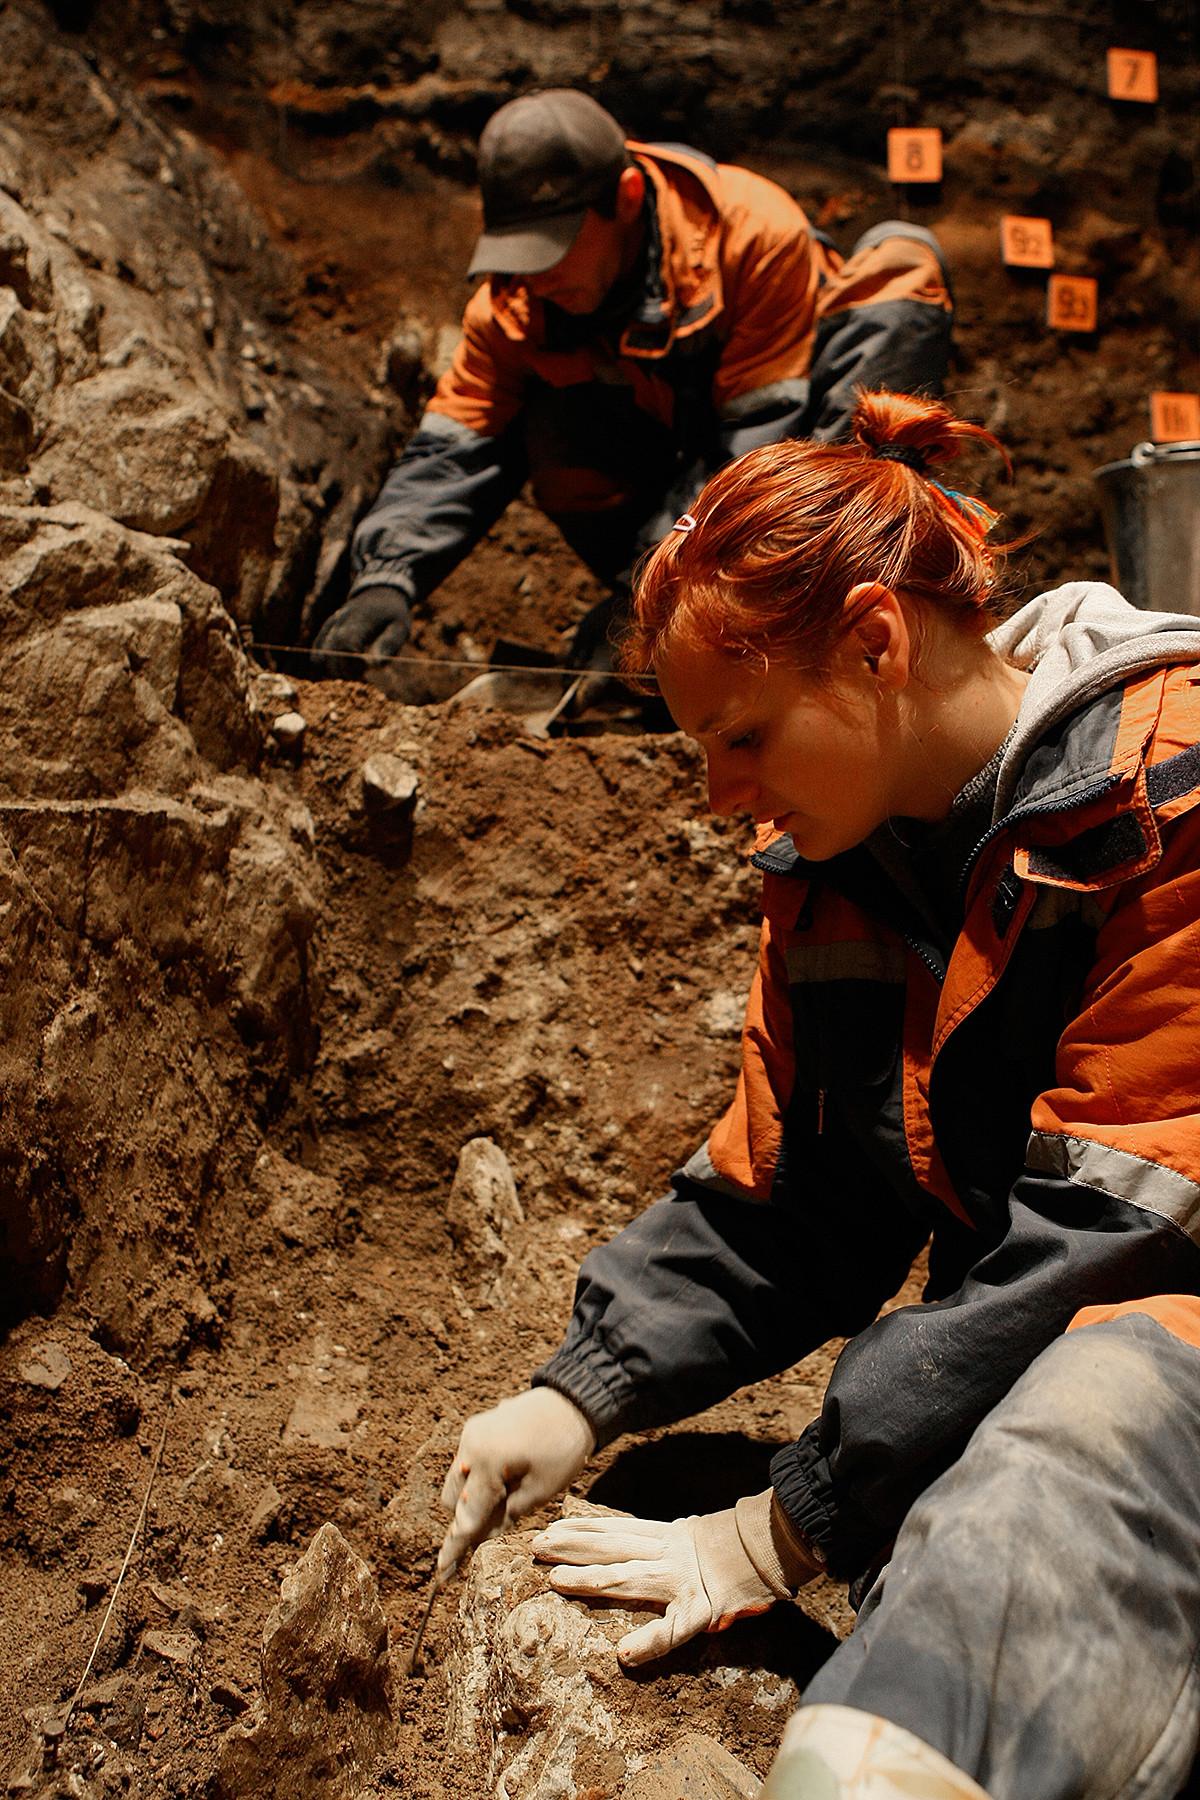 Para arkeolog dari Akademi Ilmu Pengetahuan Rusia cabang Siberia melakukan penggalian di Gua Denisova.